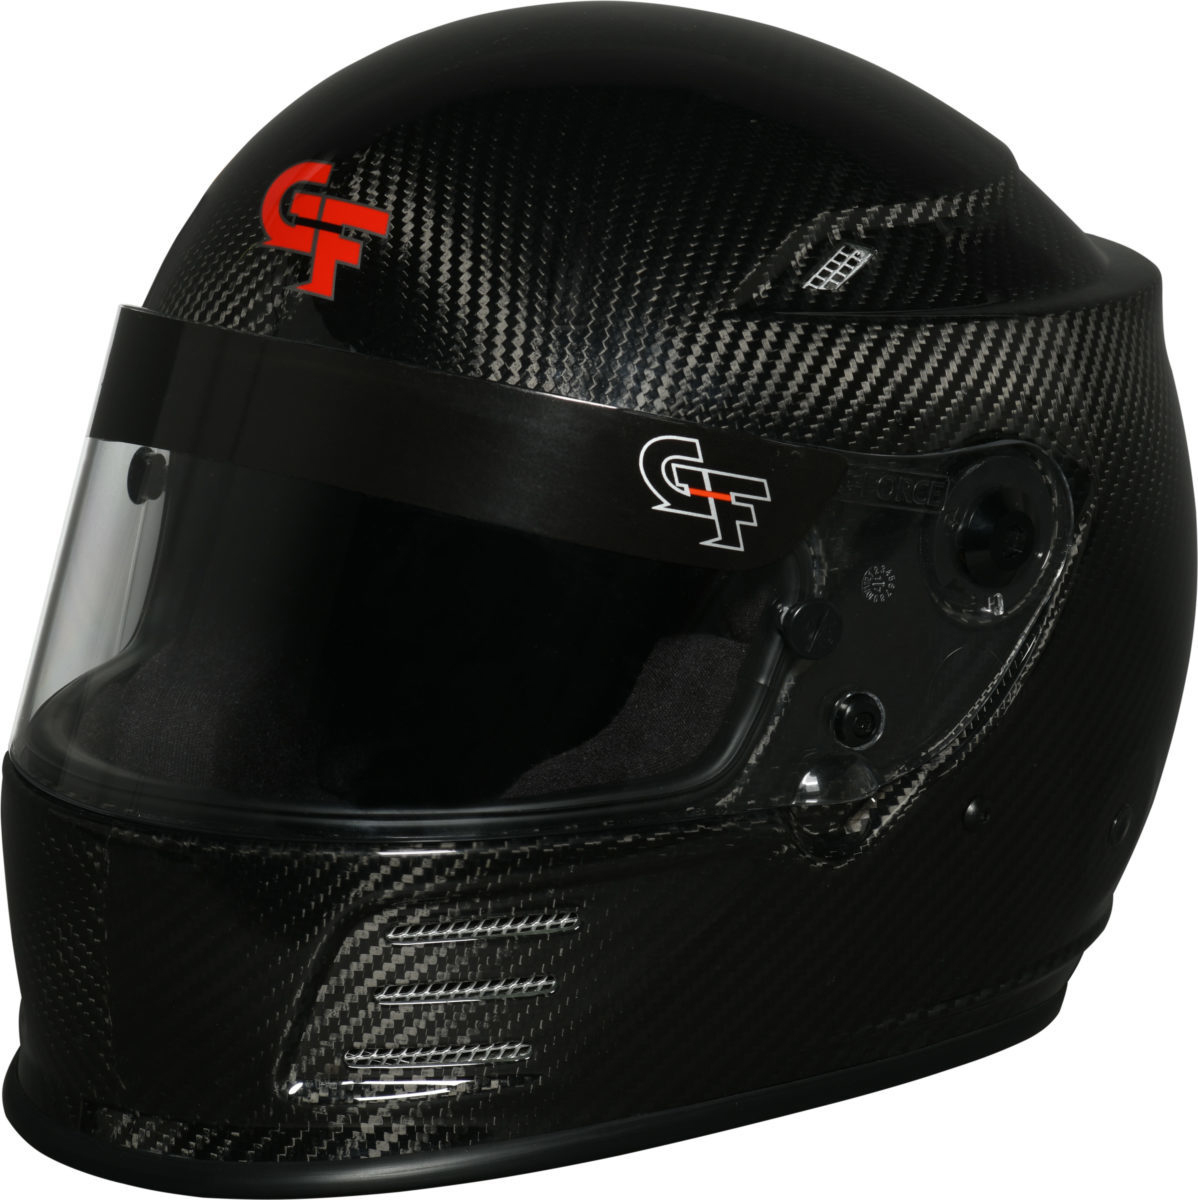 G-force Helmet Revo XX-Large Carbon SA2020